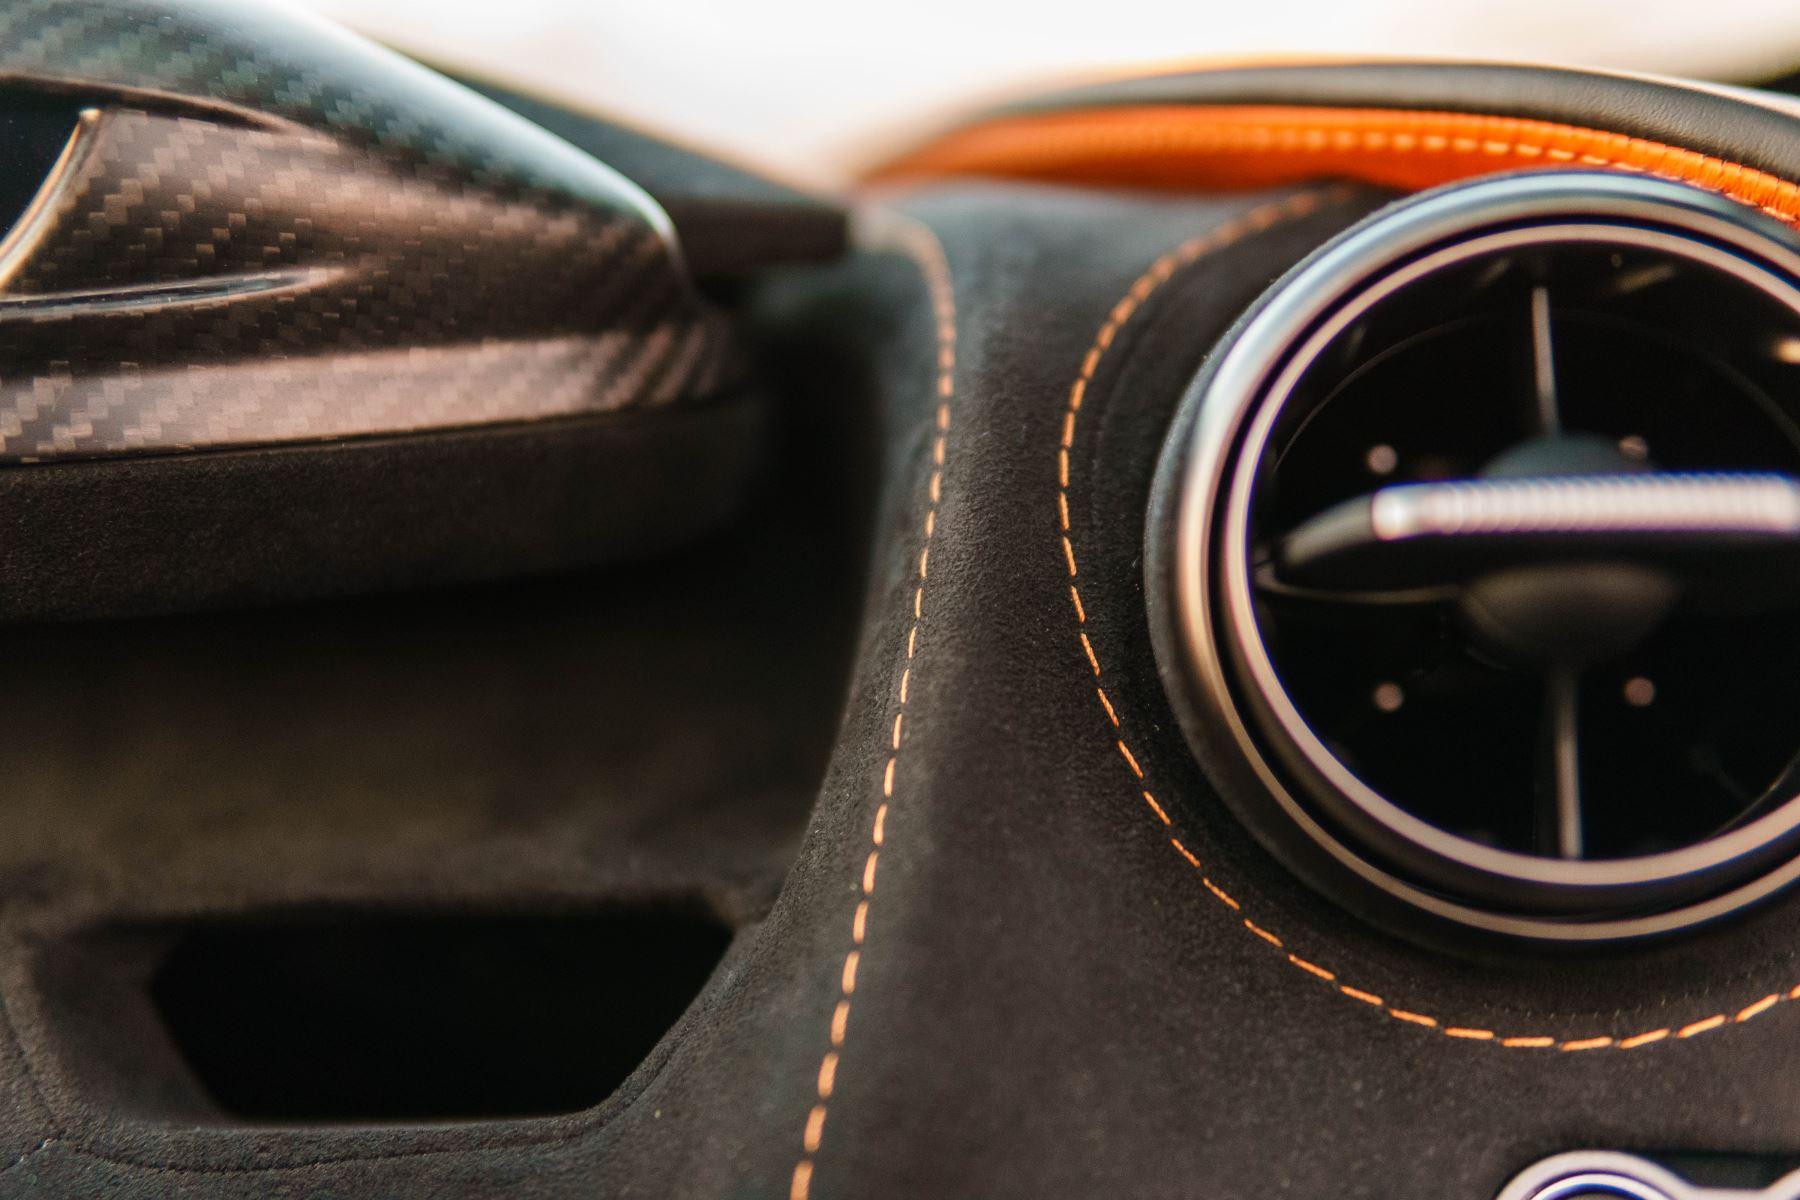 McLaren 720S Performance Coupe  image 23